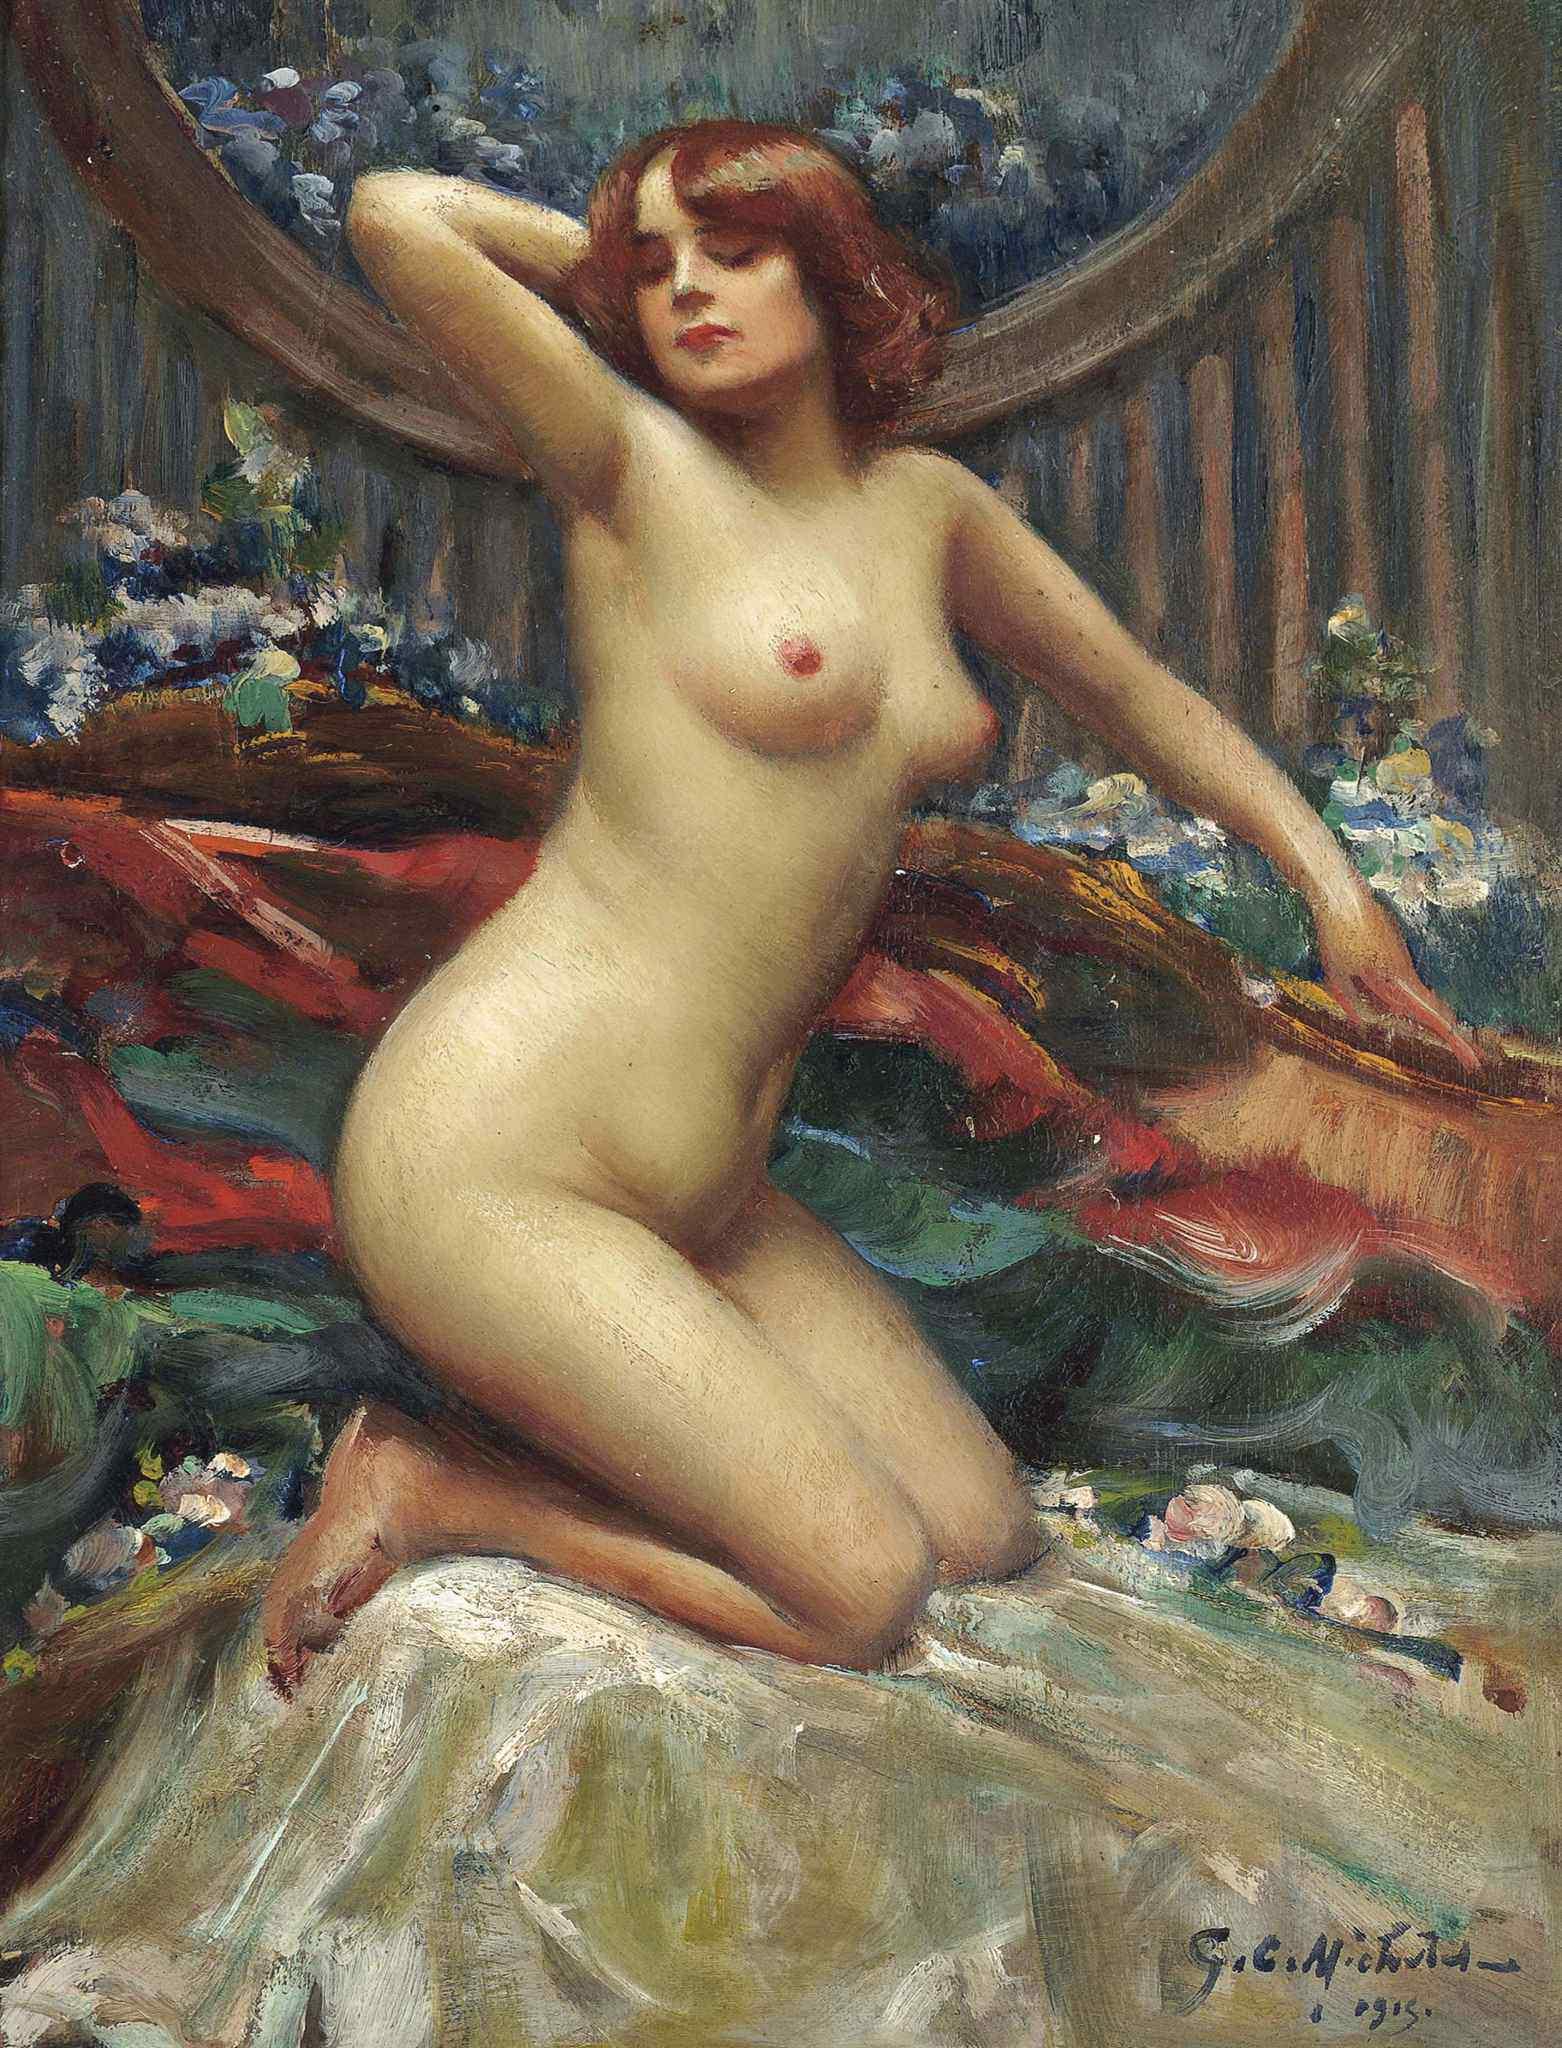 George C. Michelet, род в 1873. Соблазнительница. 1915. 26 x 19.5 см. Частная коллекция